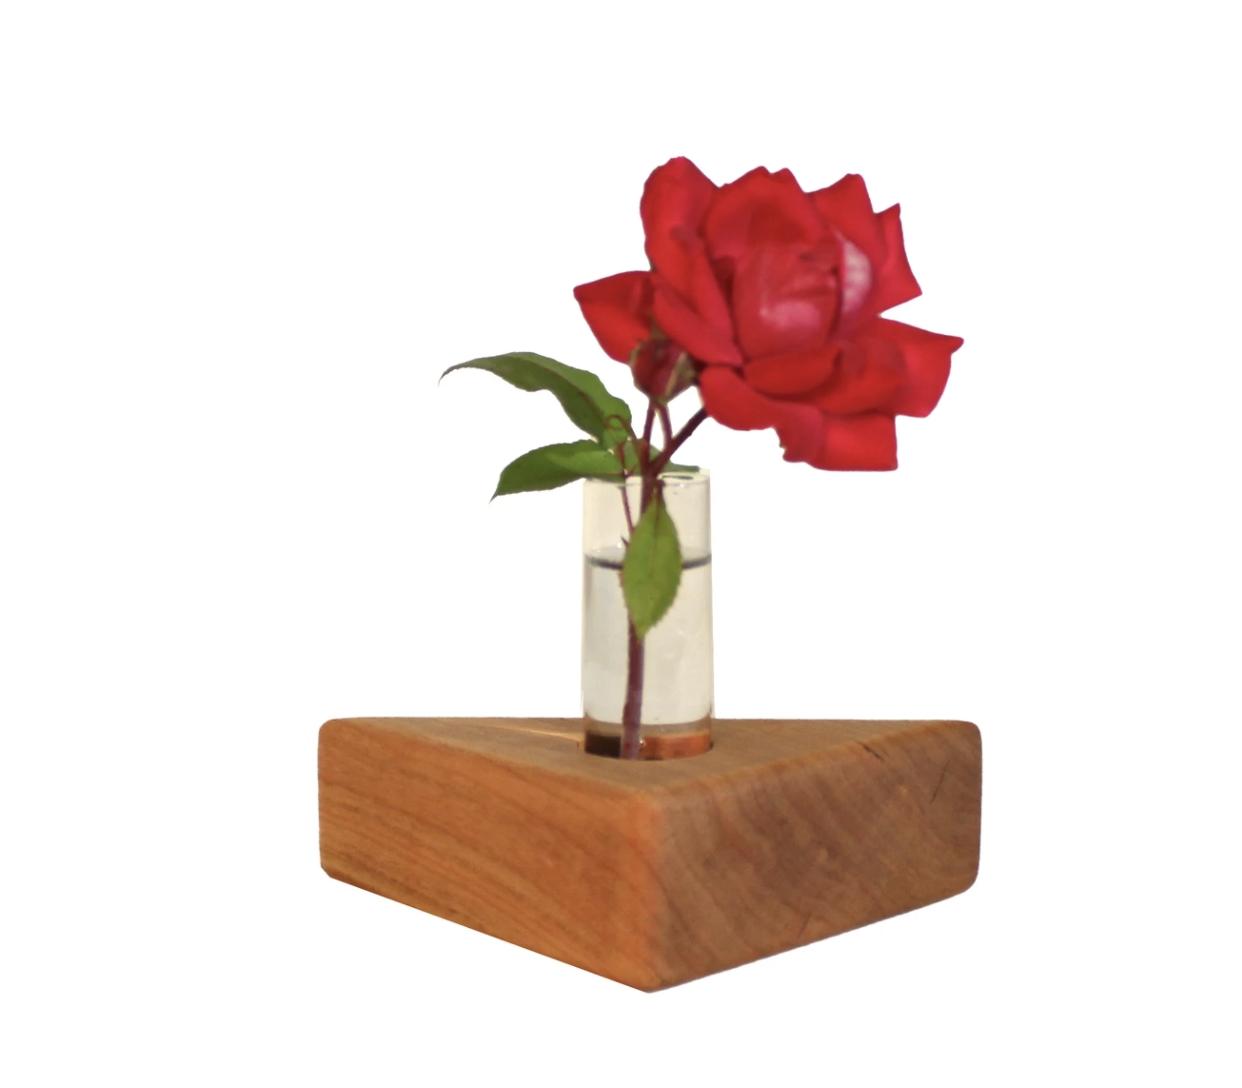 Sabbath Day Wood Triangle Vase